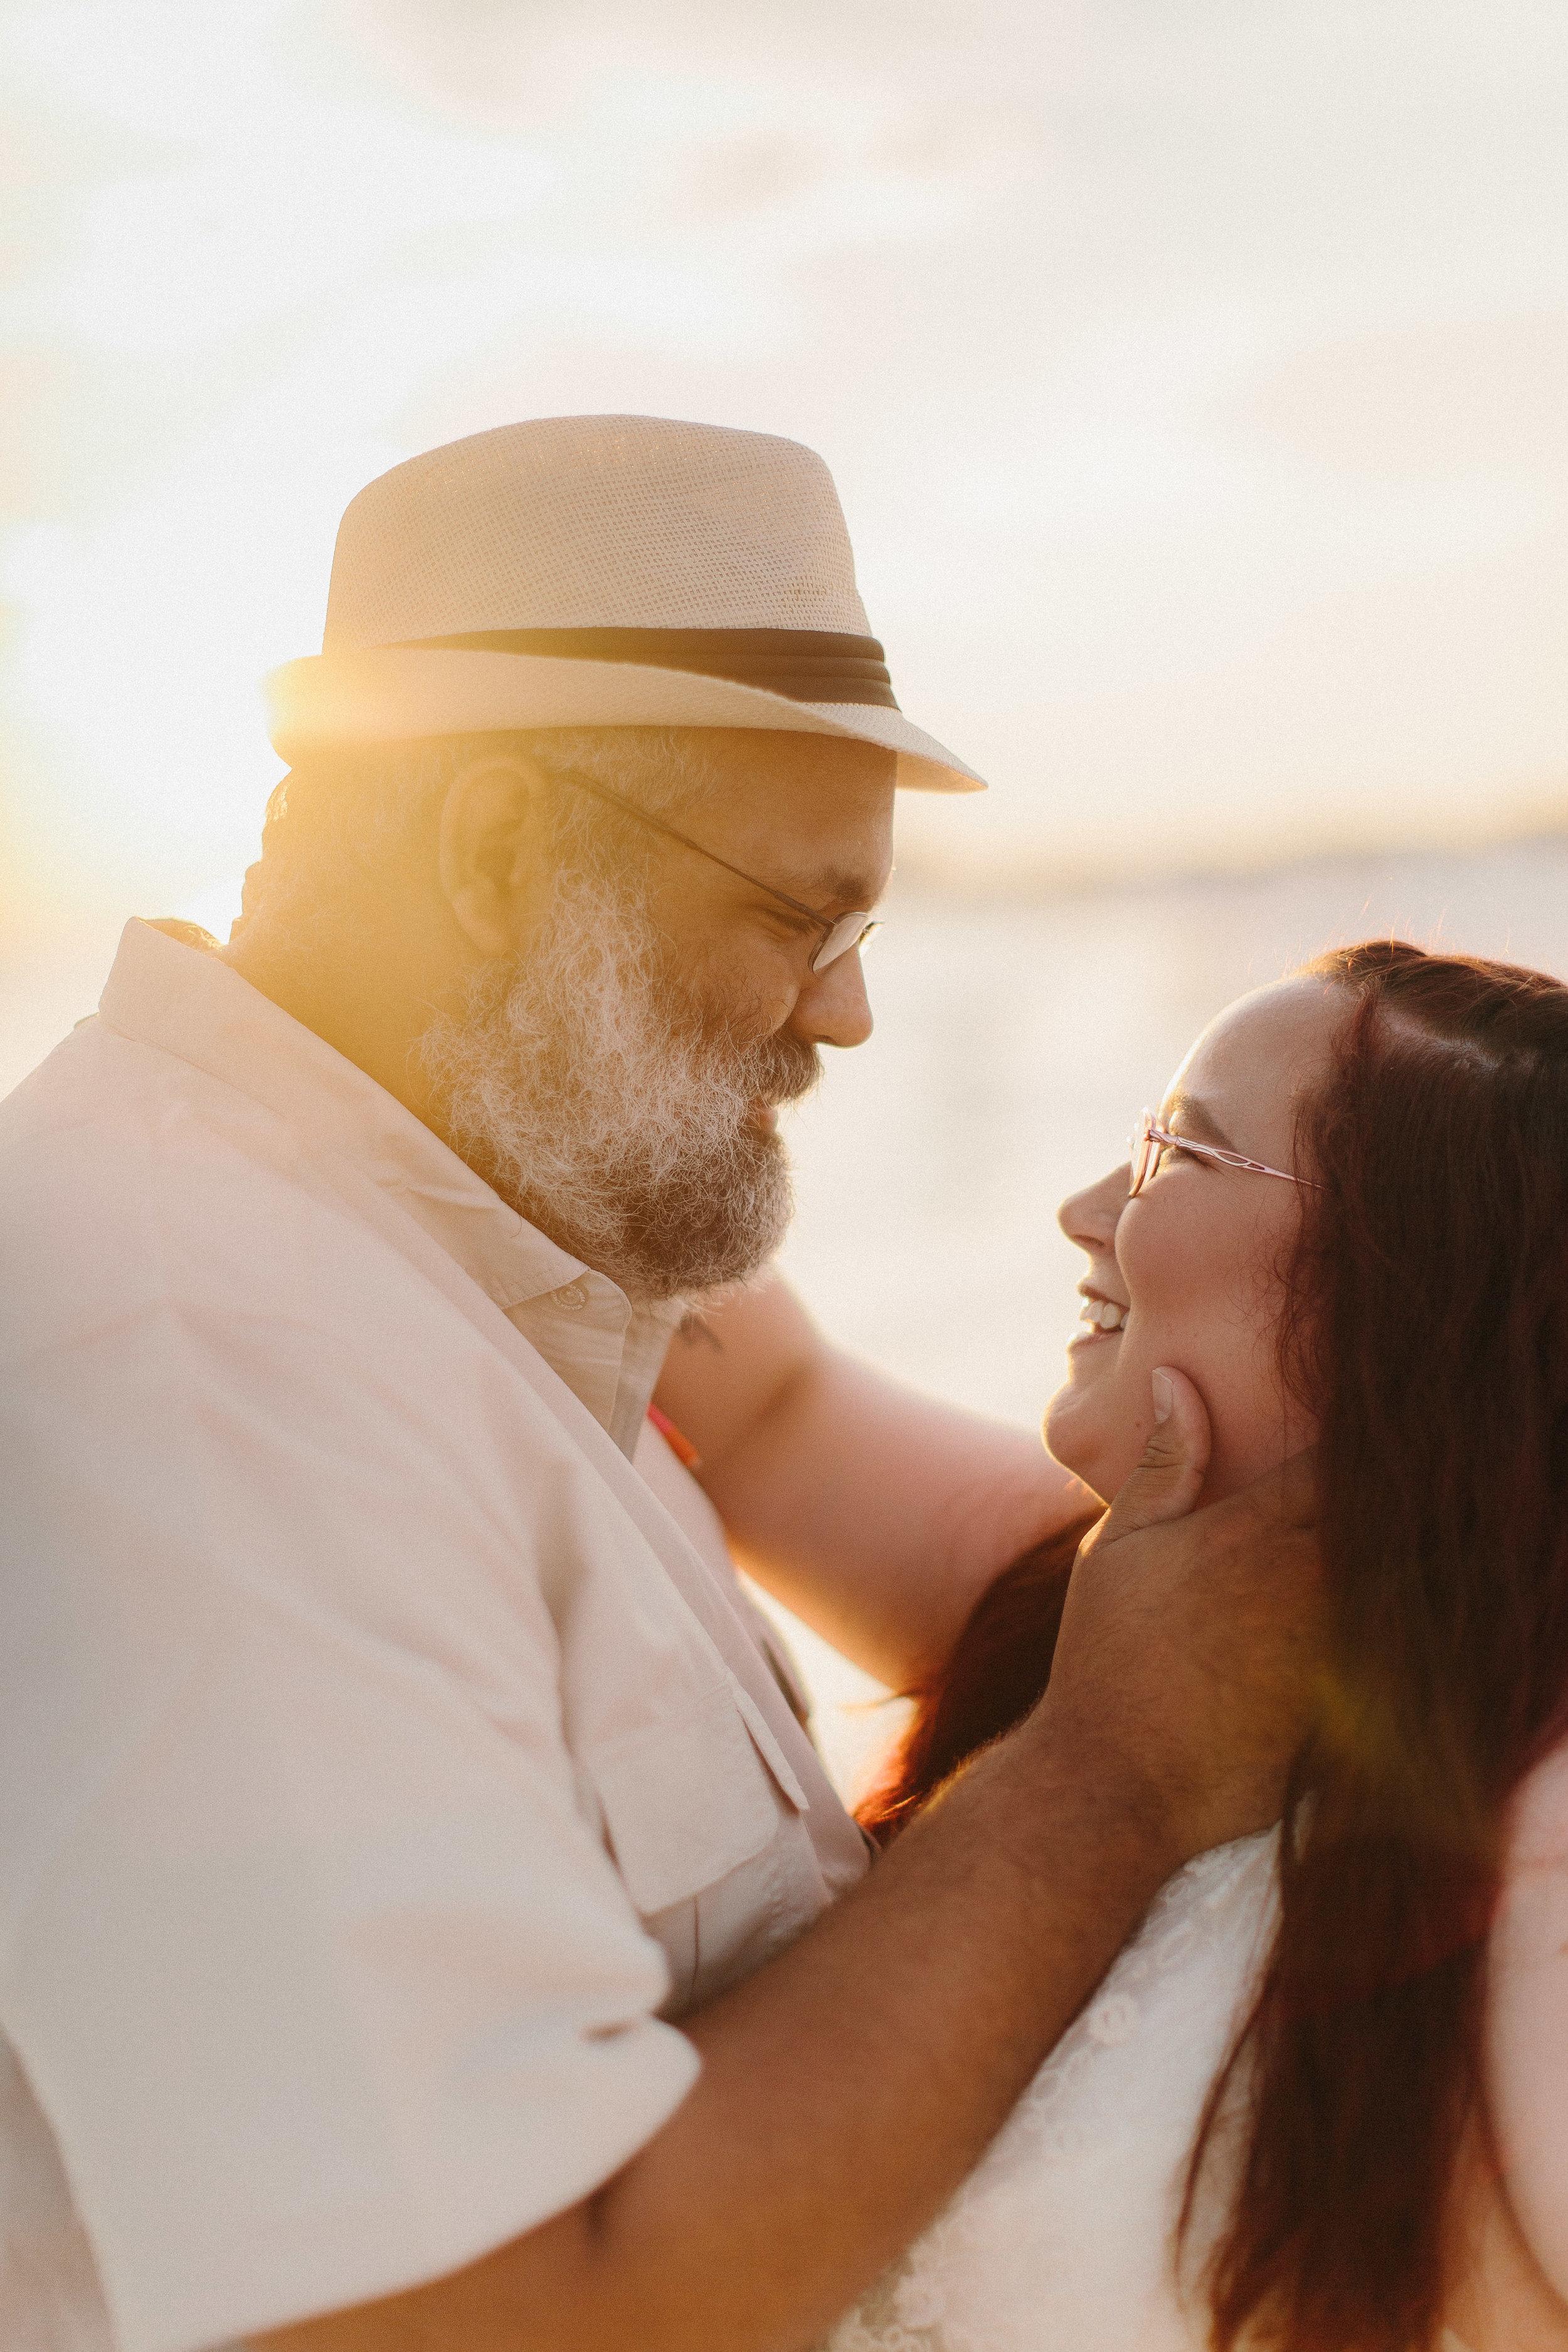 destin_sunset_beach_elopement_intimate_wedding_photographer_florida_documentary_1273.jpg